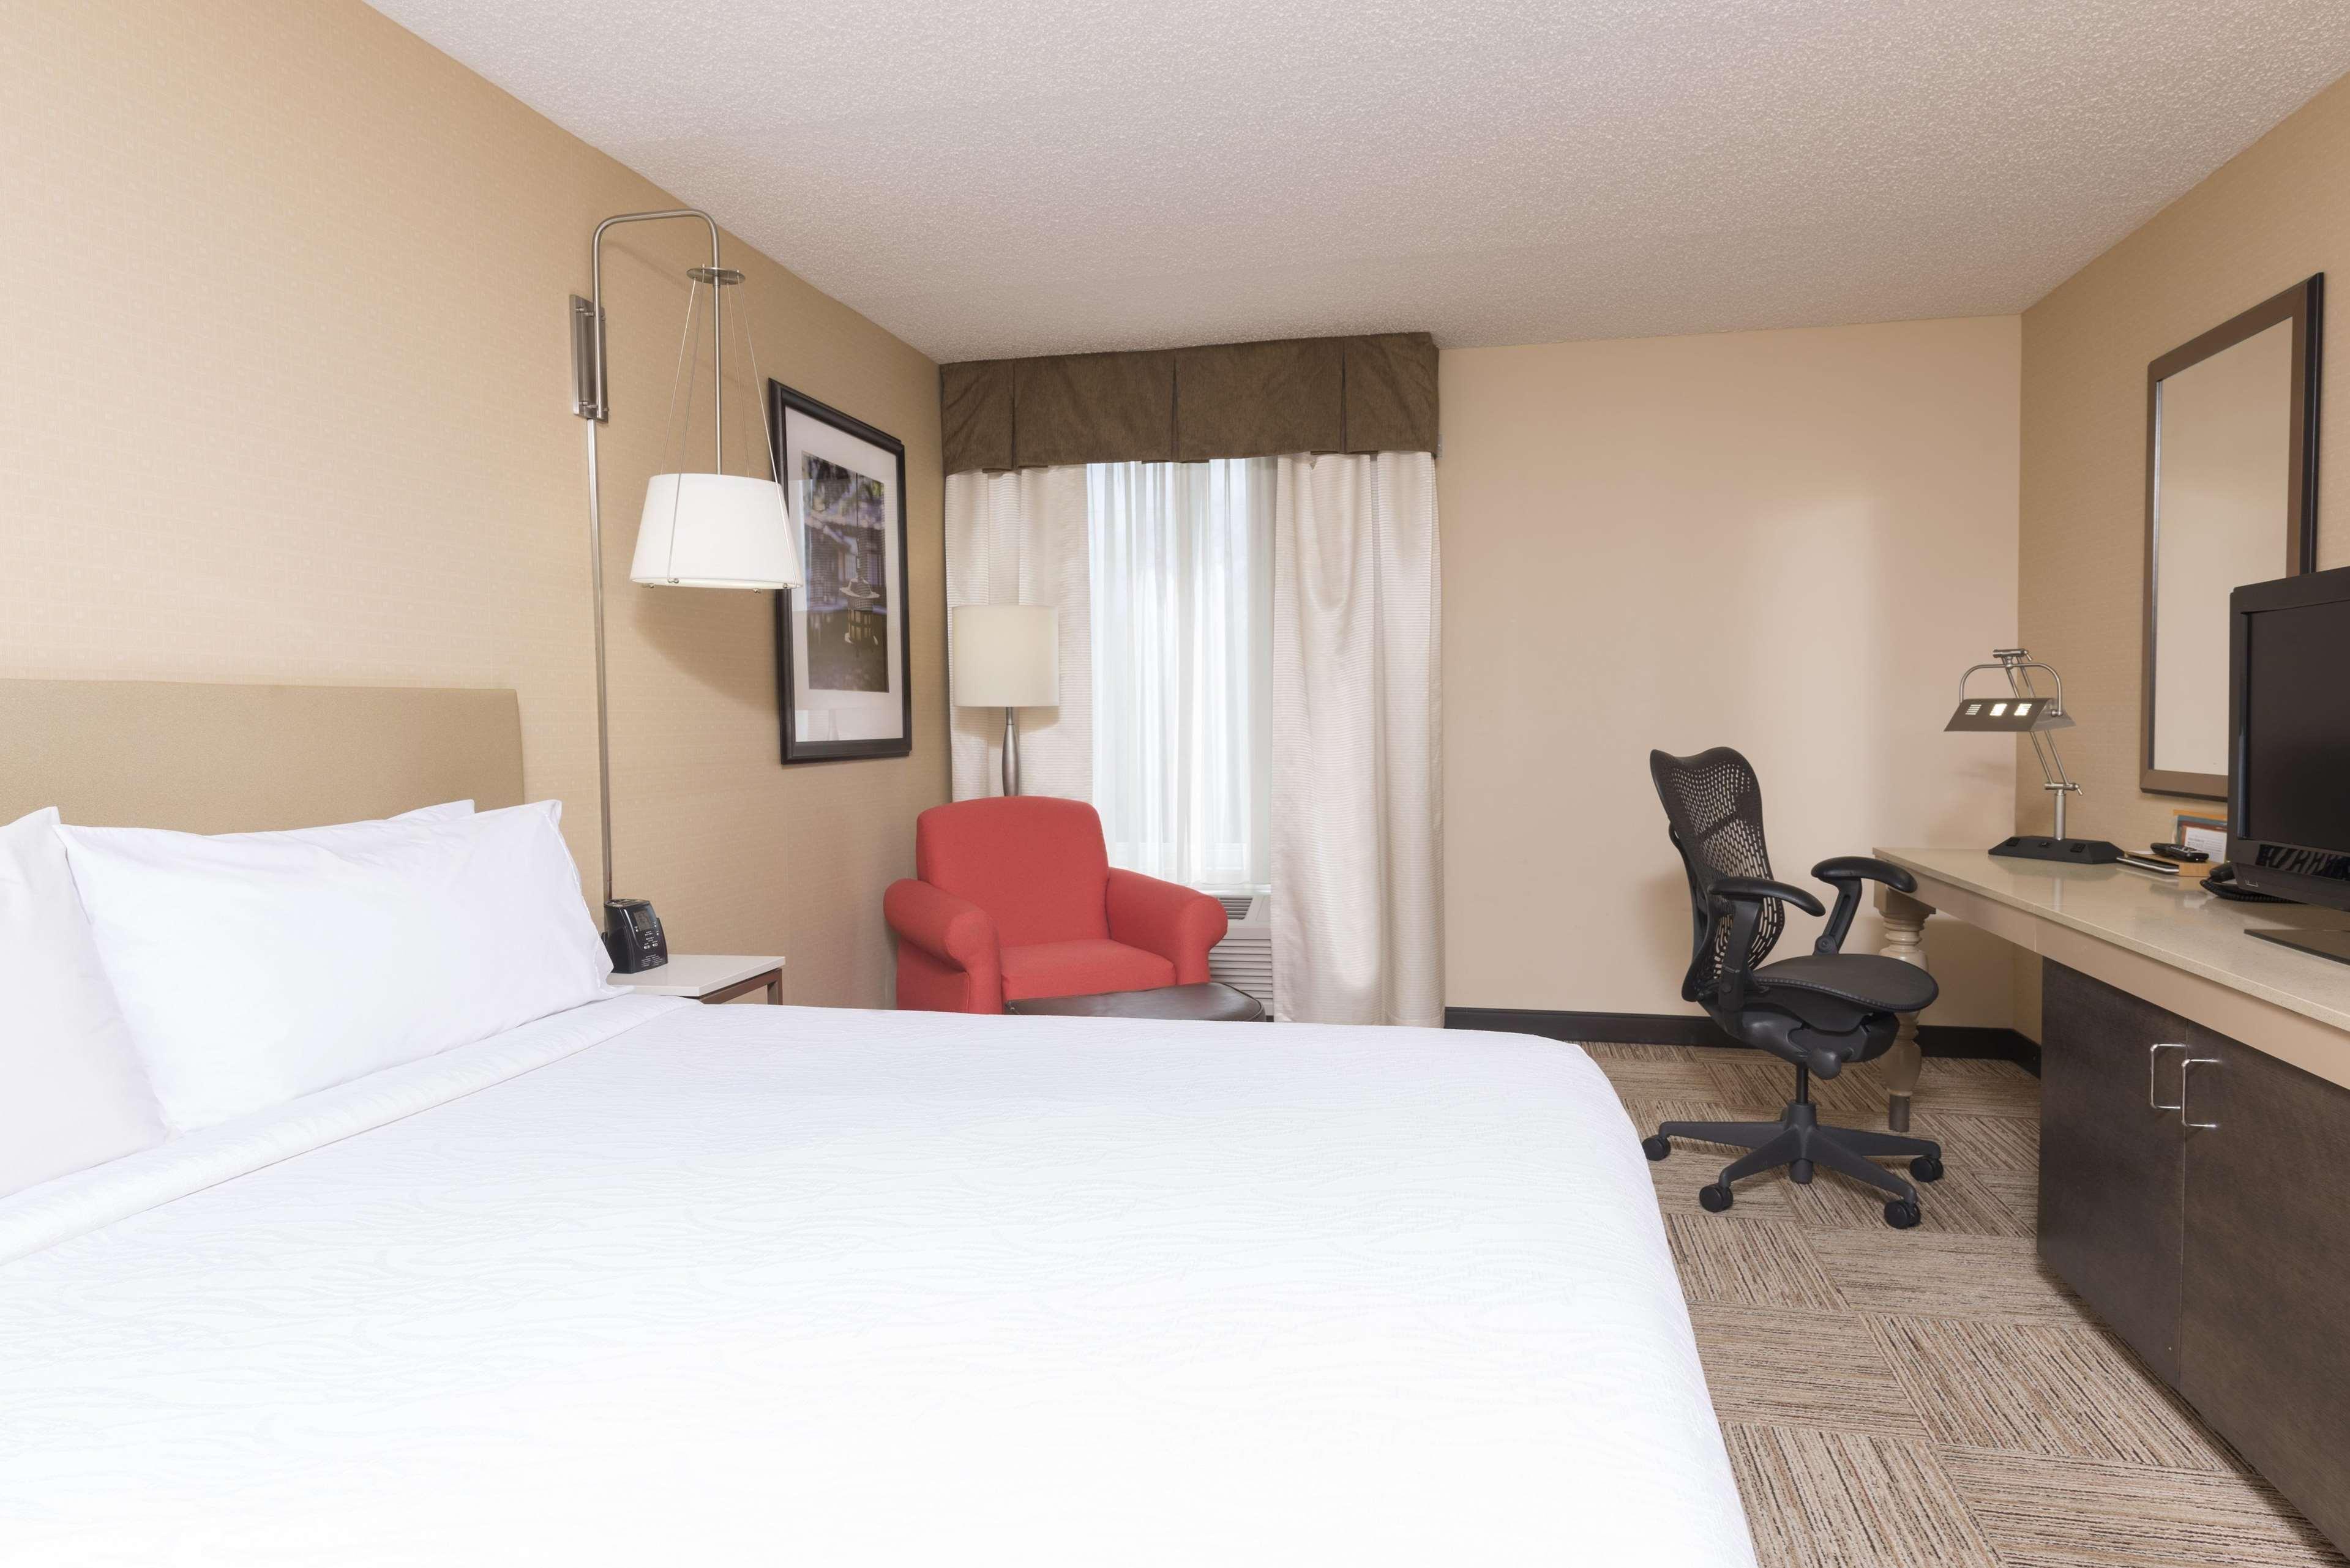 Hilton Garden Inn West Lafayette Wabash Landing image 15